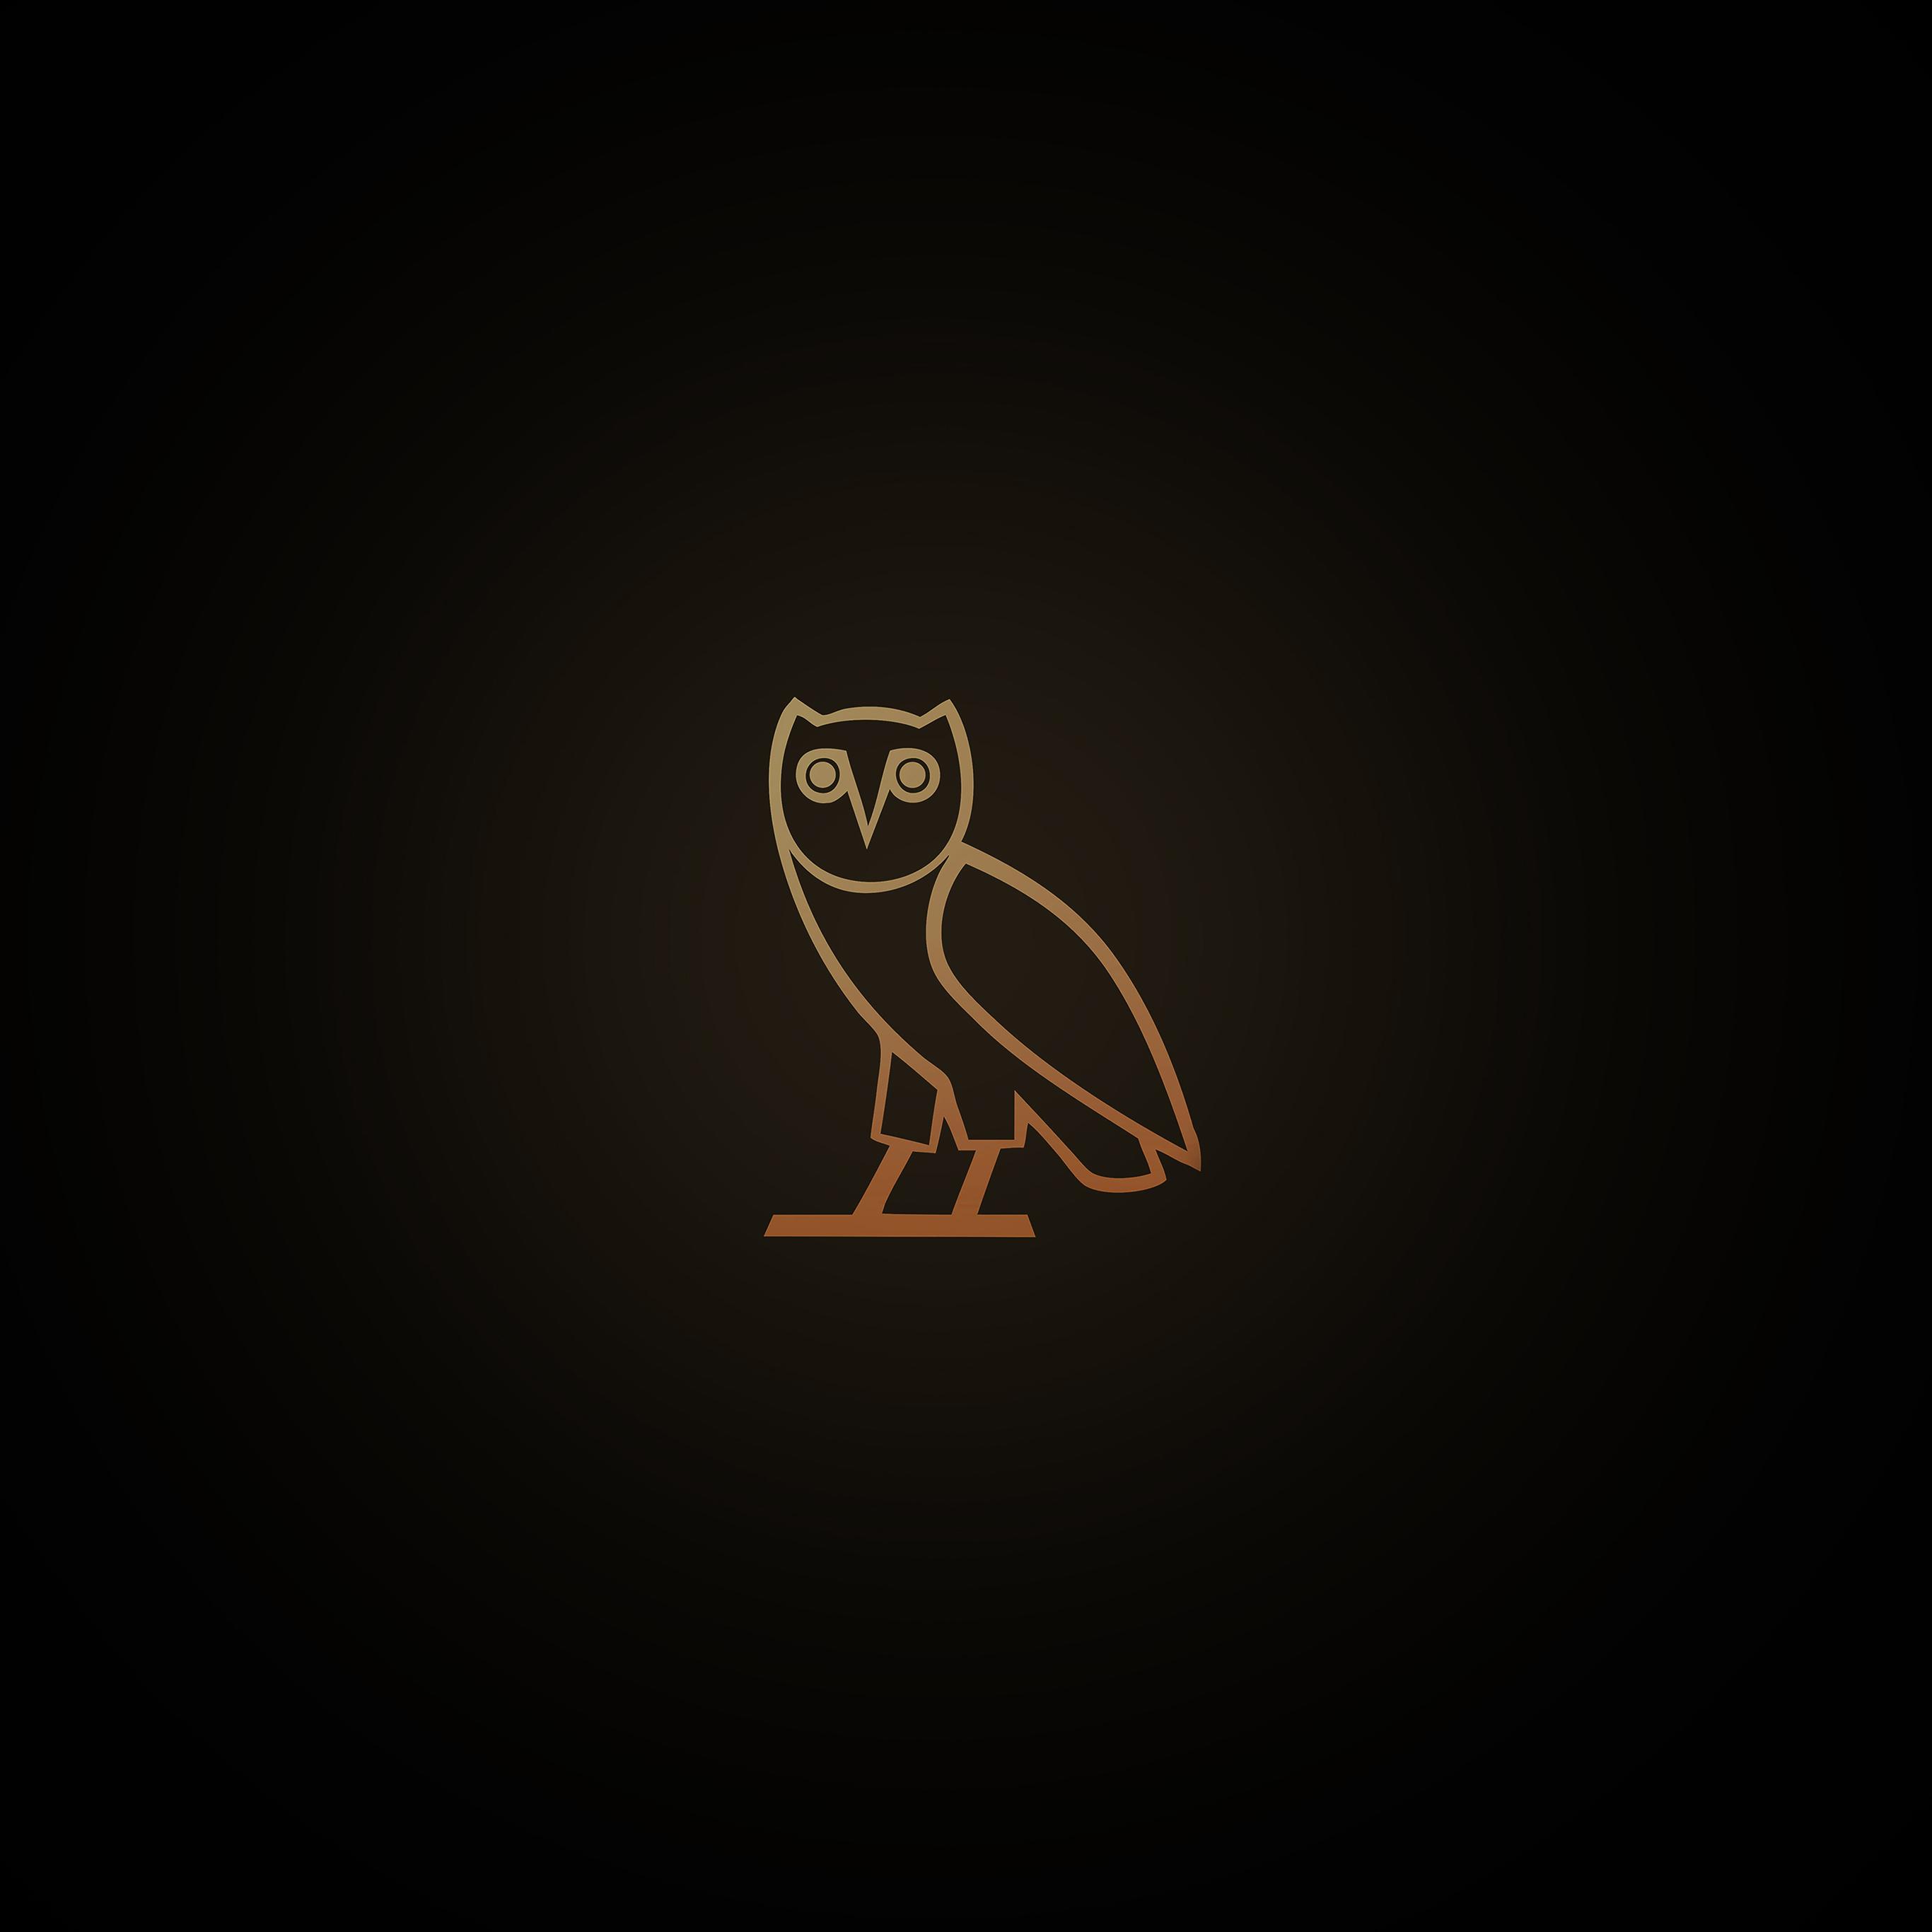 Black Car Wallpaper 1080p Ac82 Wallpaper Ovo Owl Logo Dark Minimal Papers Co